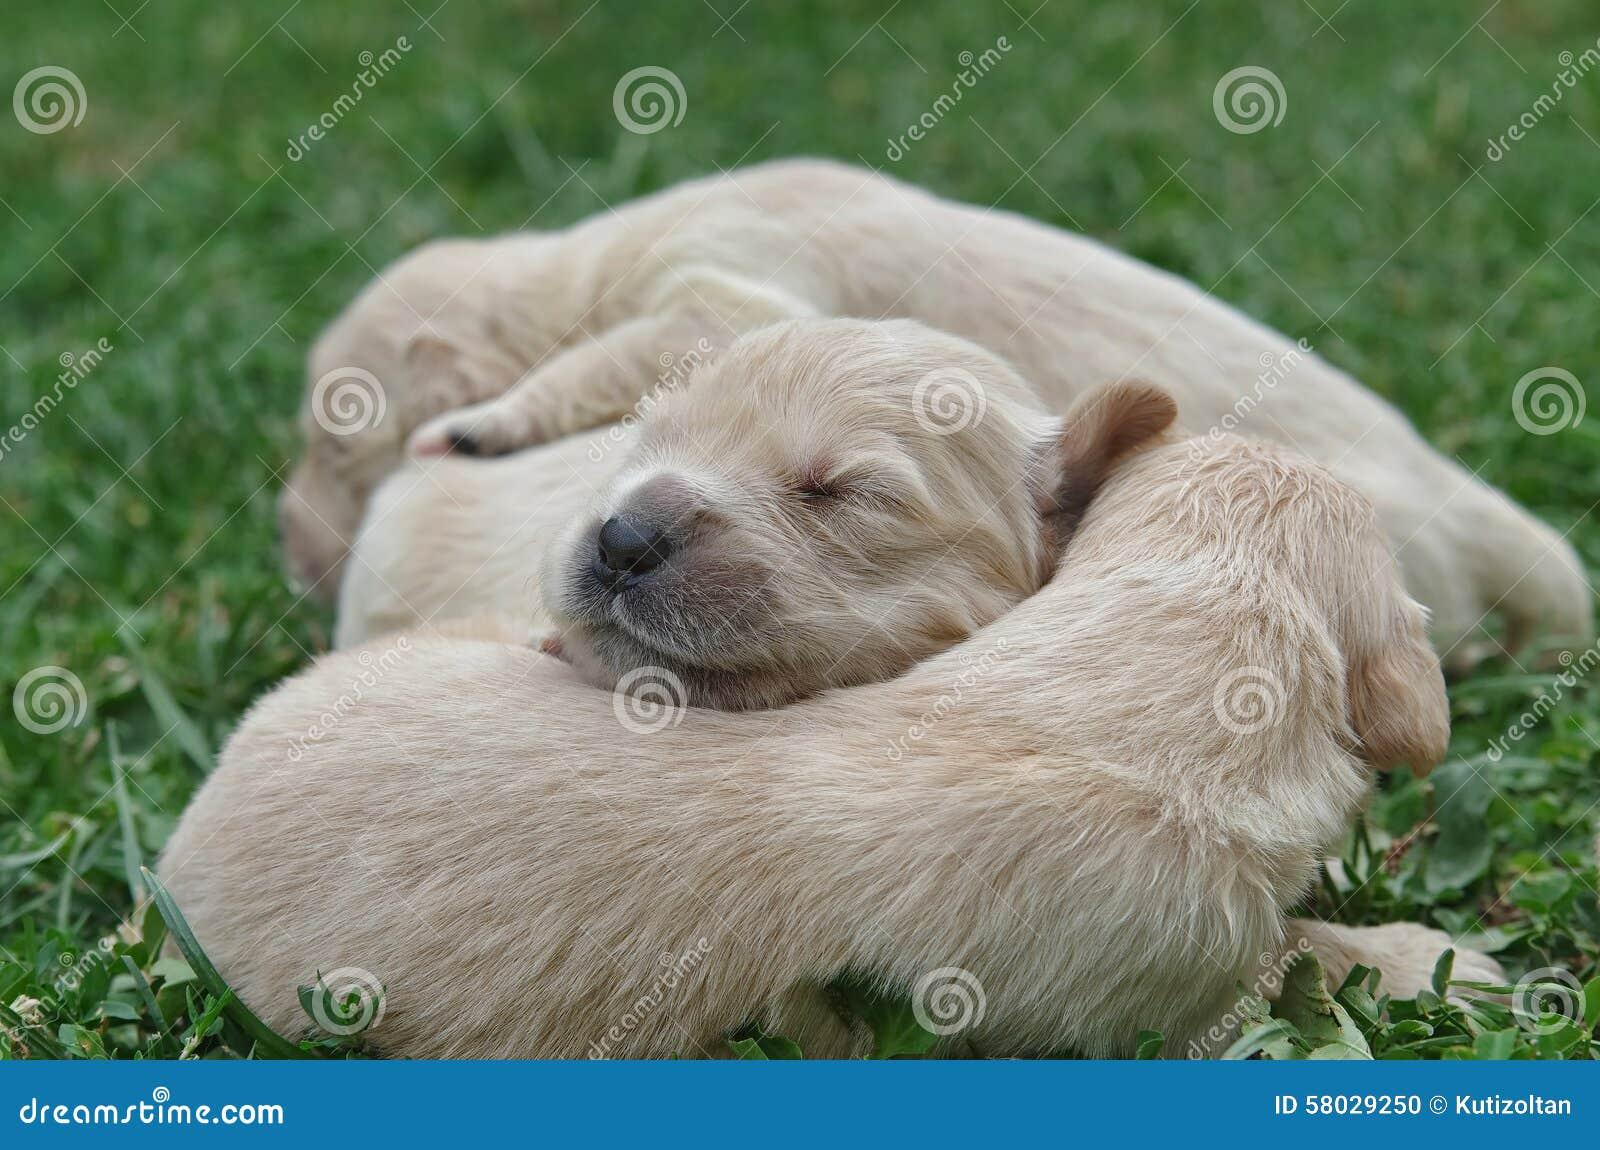 cute golden retriever puppies sleeping stock photo - image of mammal